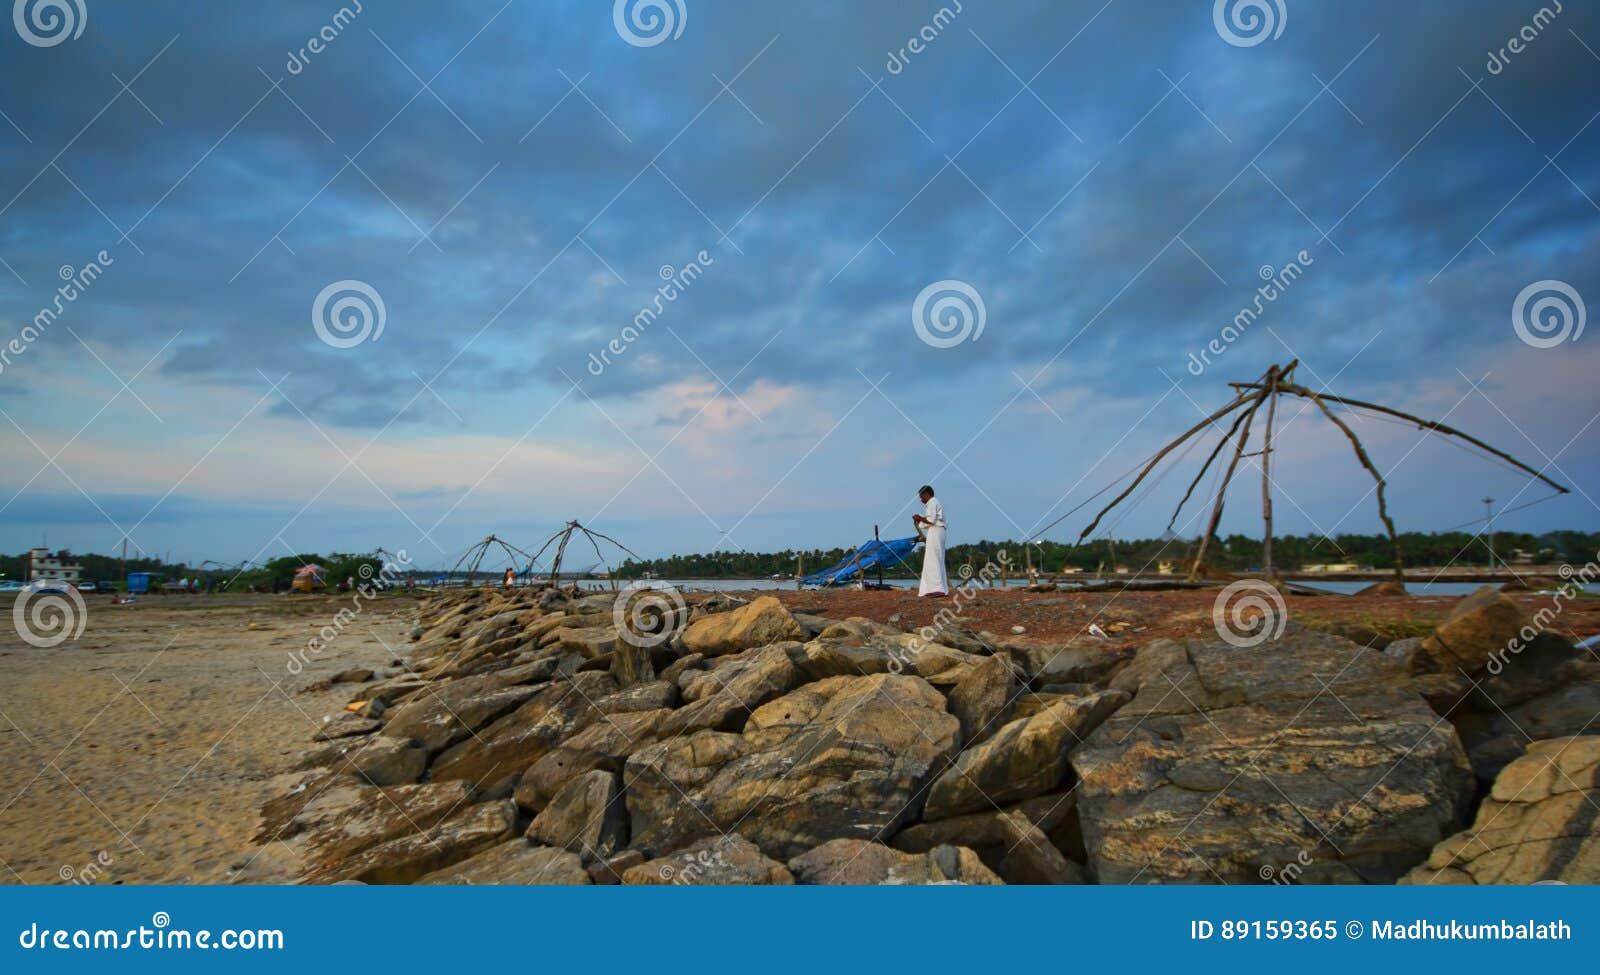 Chinese Fishing net at sea shore